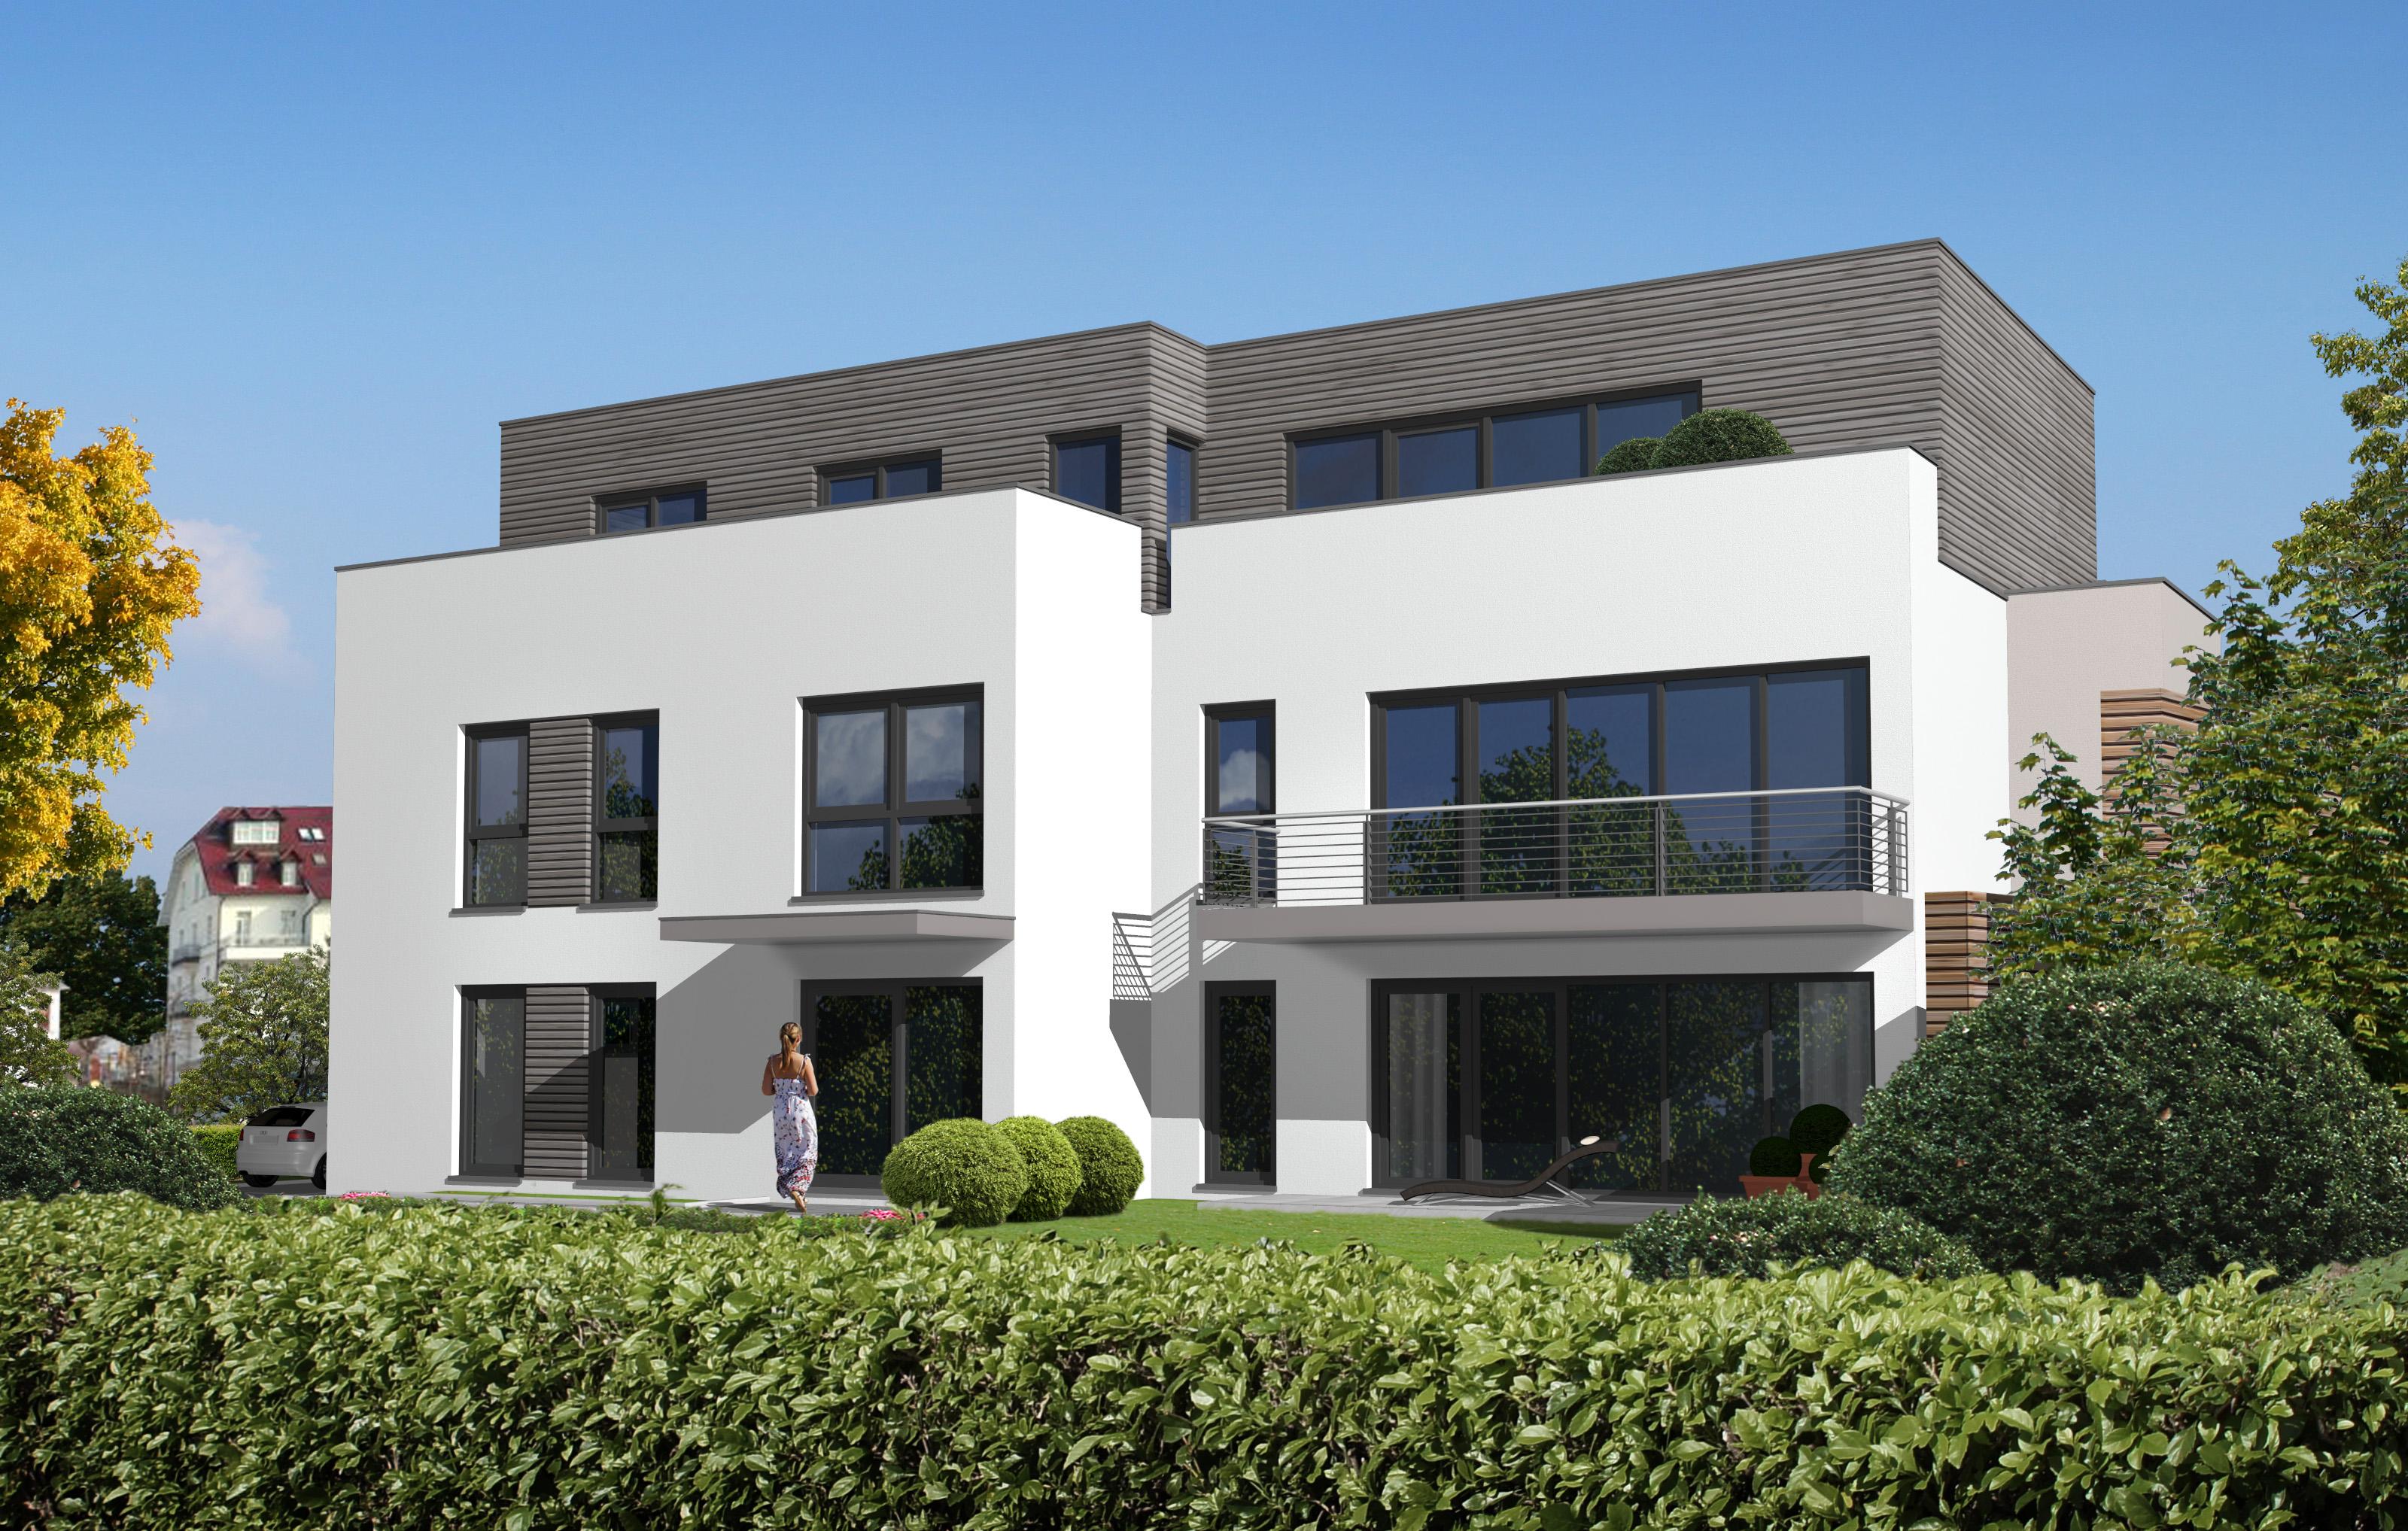 ferienwohnung in ahlbeck seebad quartier ahlbeck app 03 usedomtravel. Black Bedroom Furniture Sets. Home Design Ideas